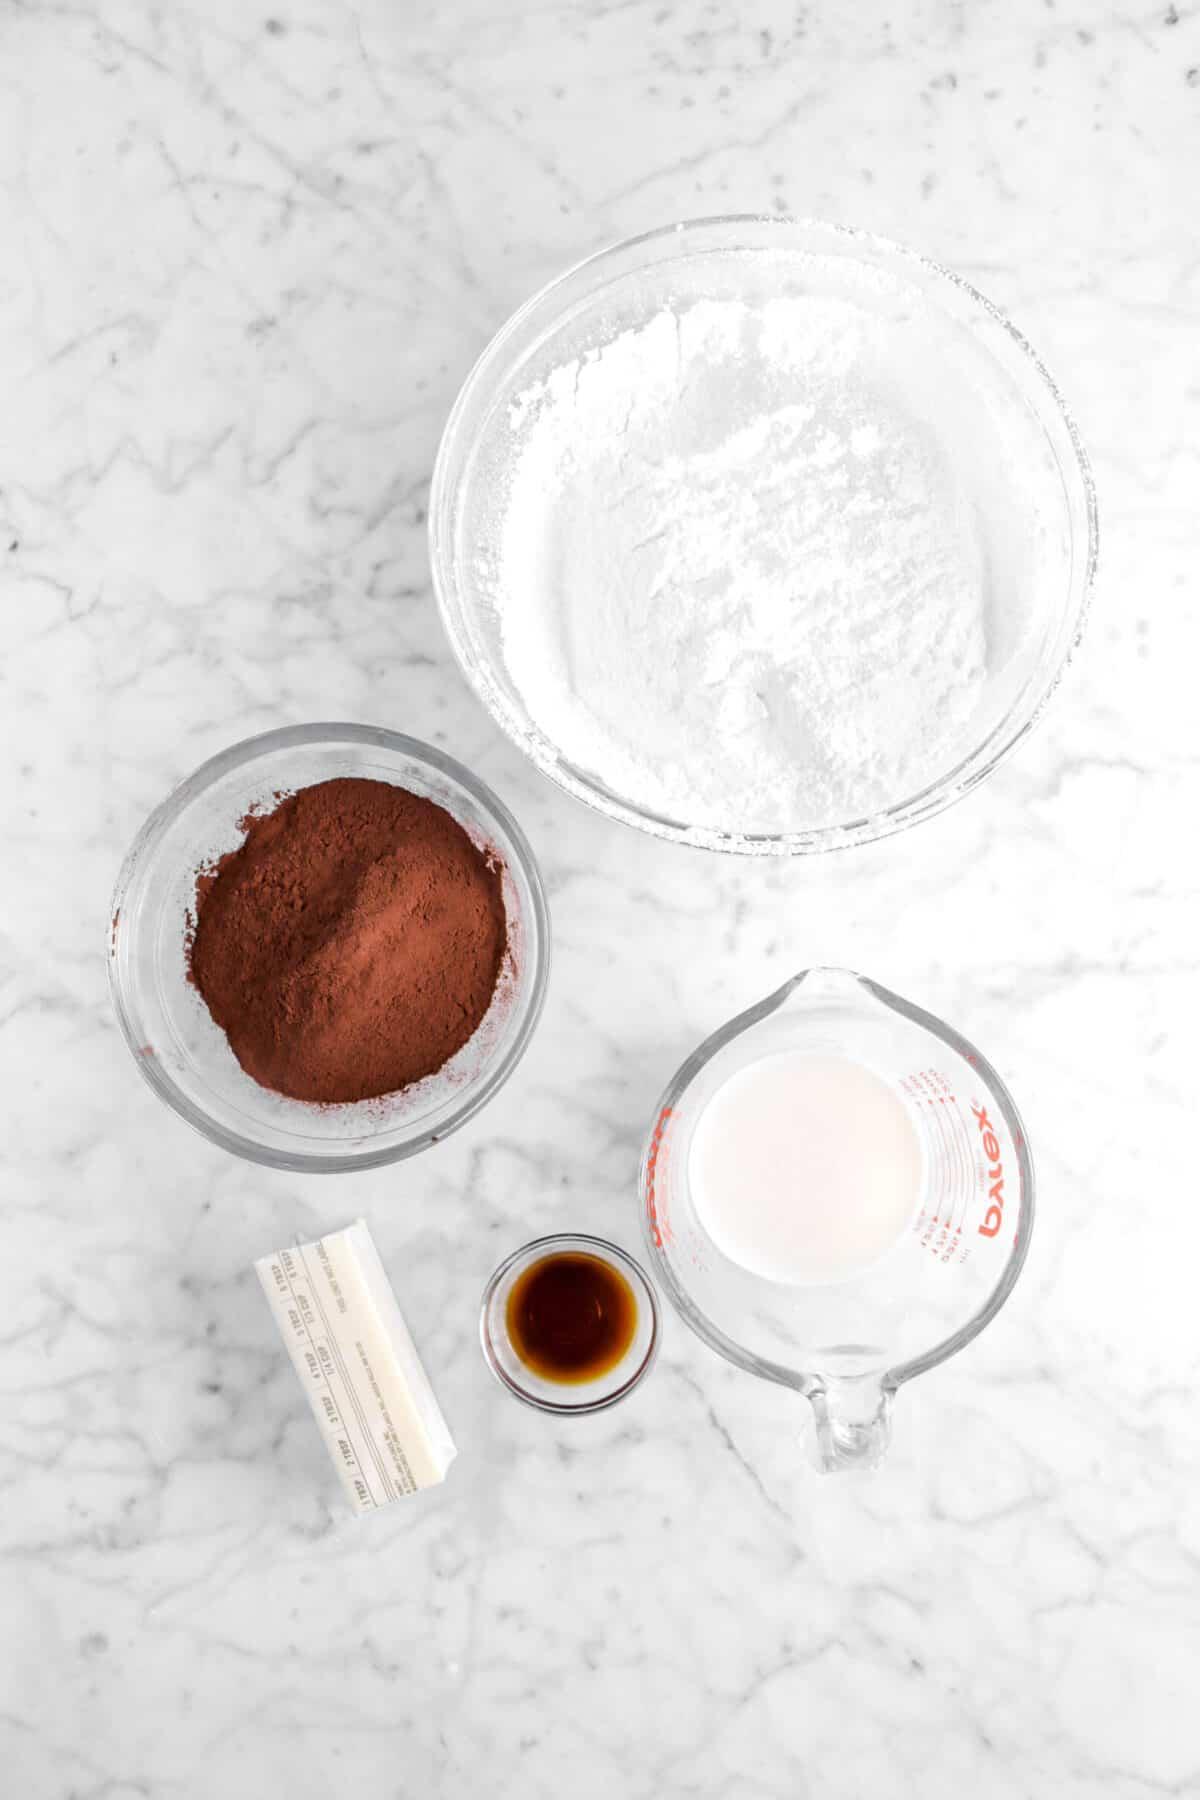 powdered sugar, cocoa powder, milk, vanilla, and butter on marble counter